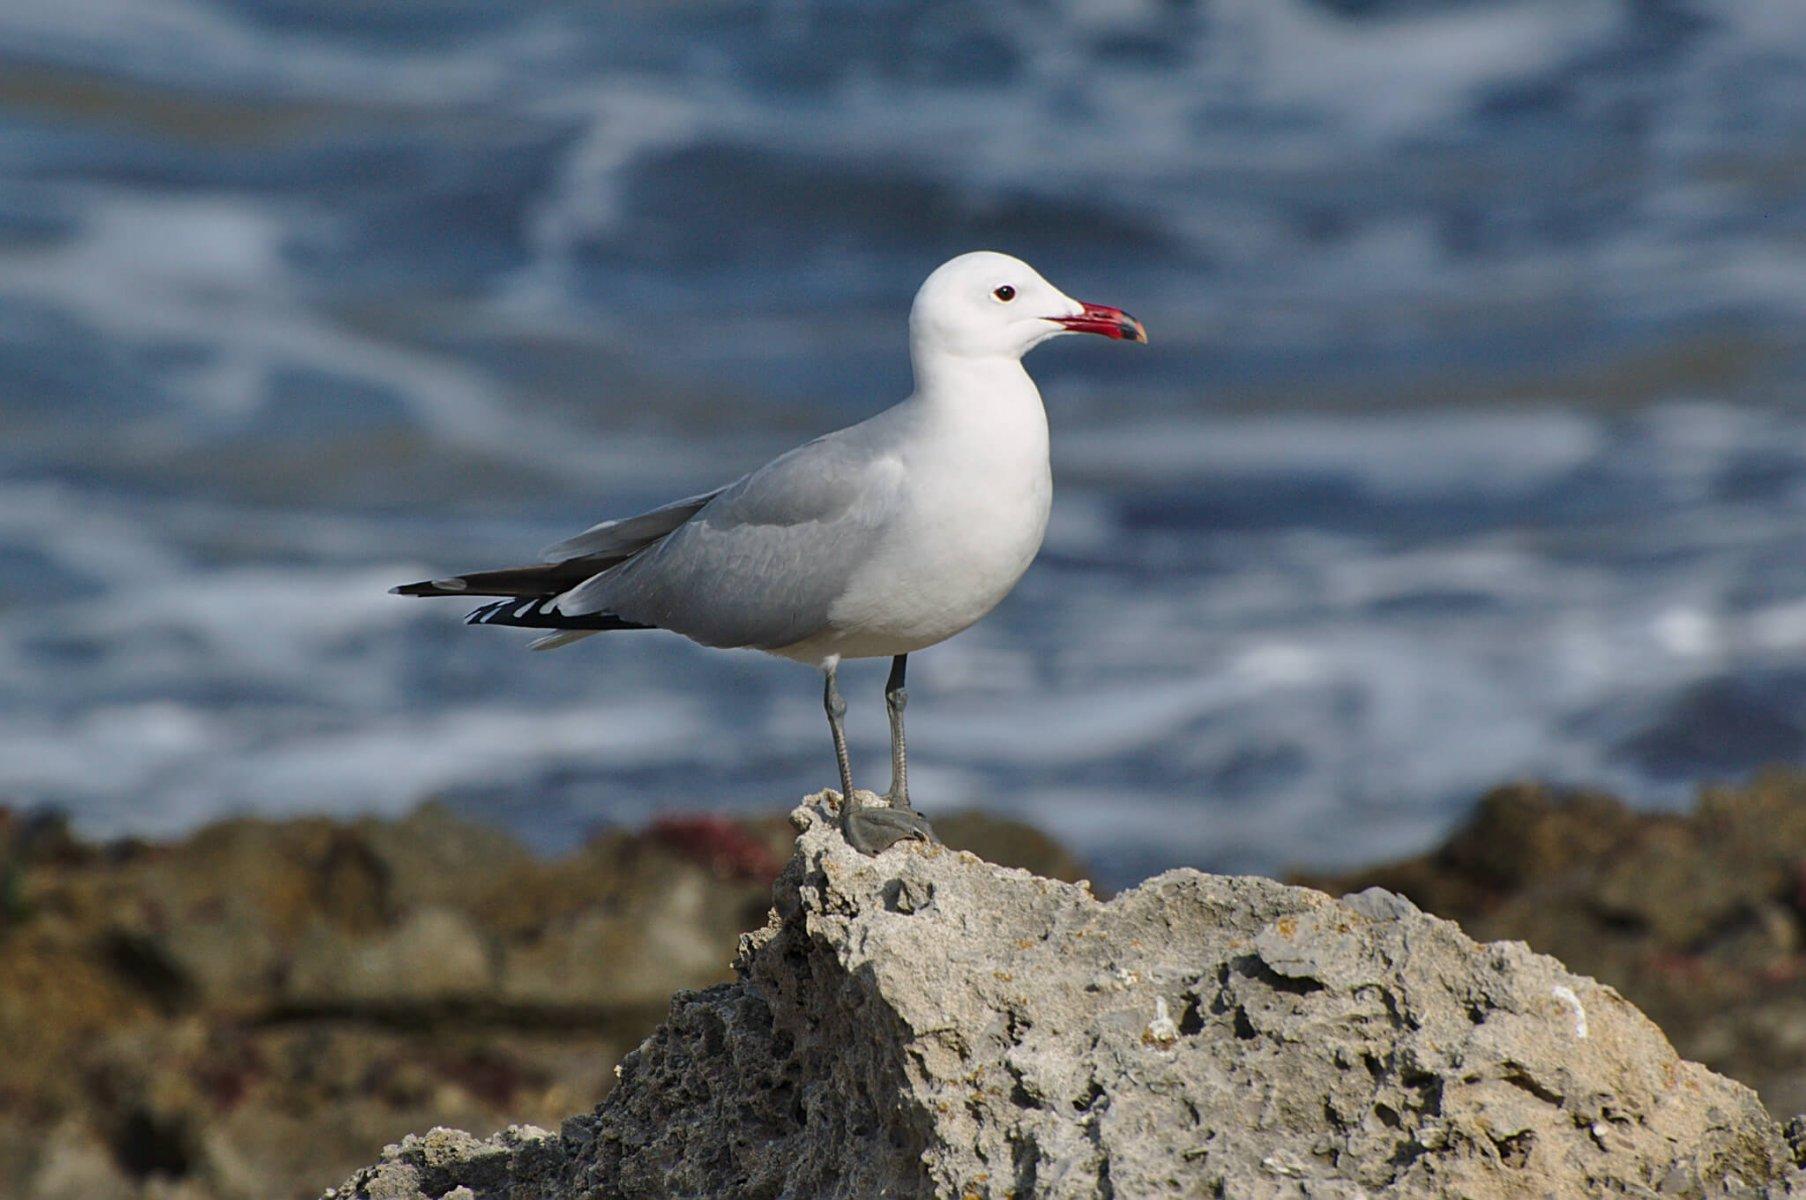 When predators strike, Audouin's Gull has nowhere else to flee to © Pintafontes